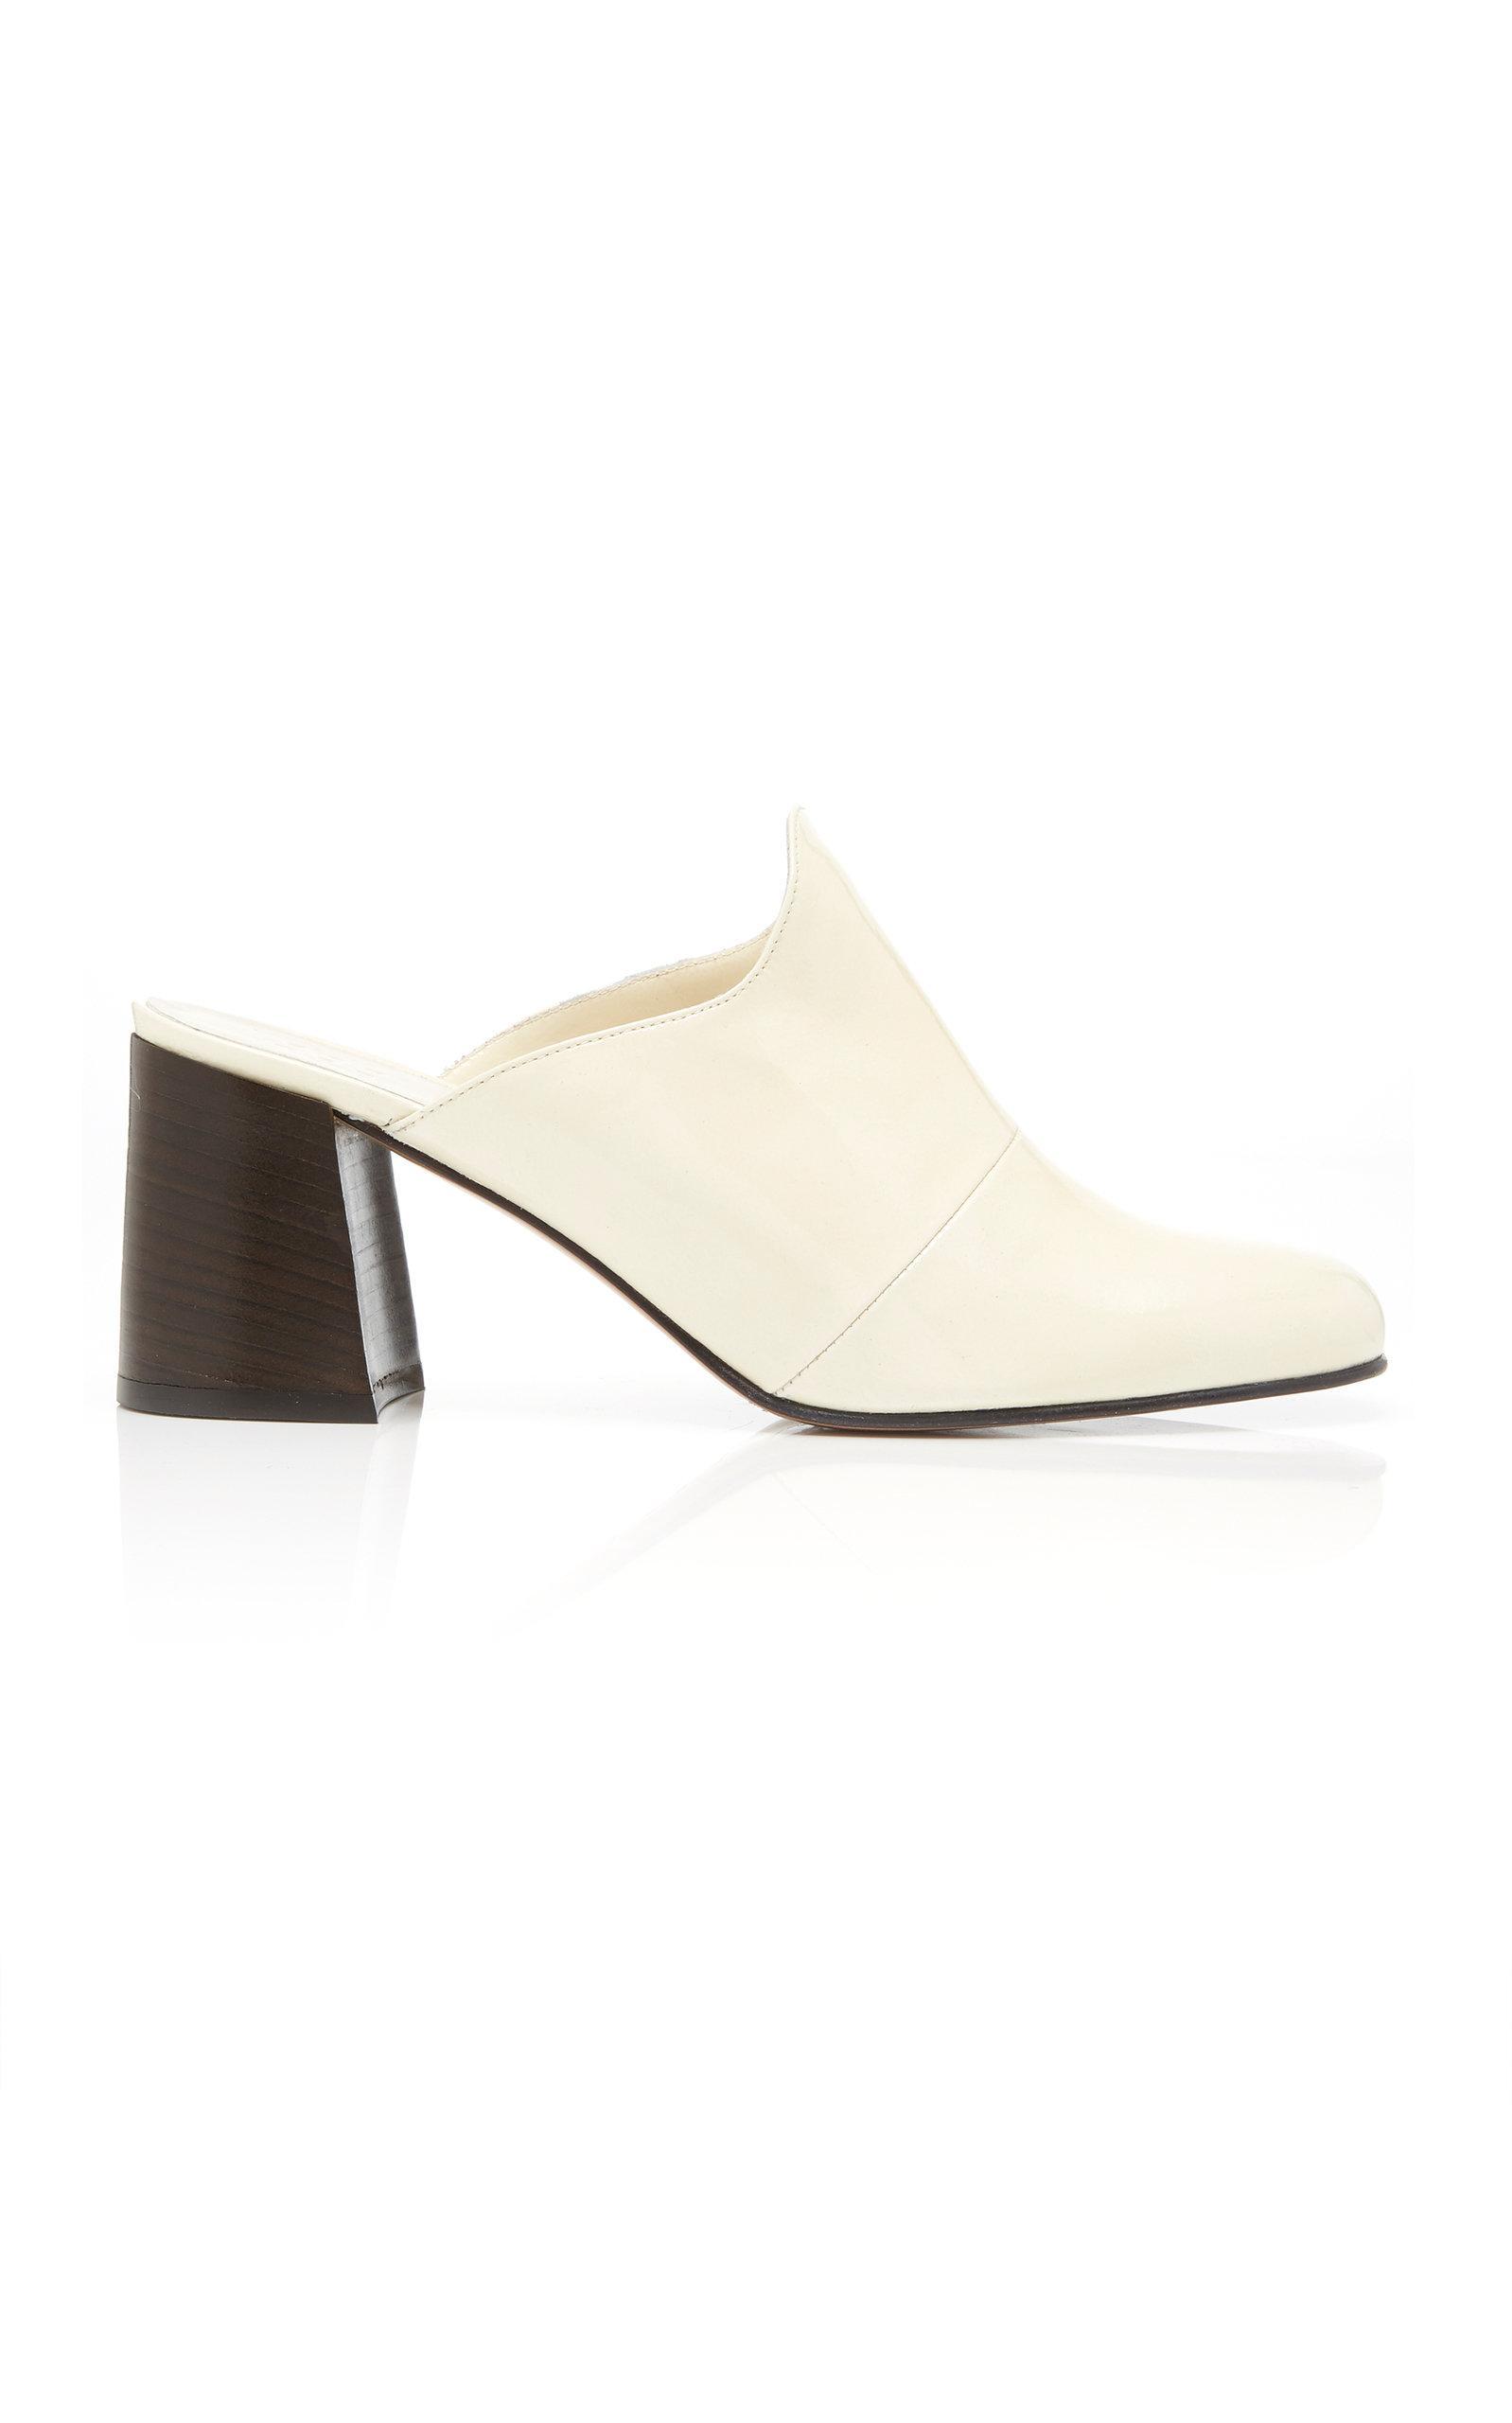 Trademark Frances Mule In White